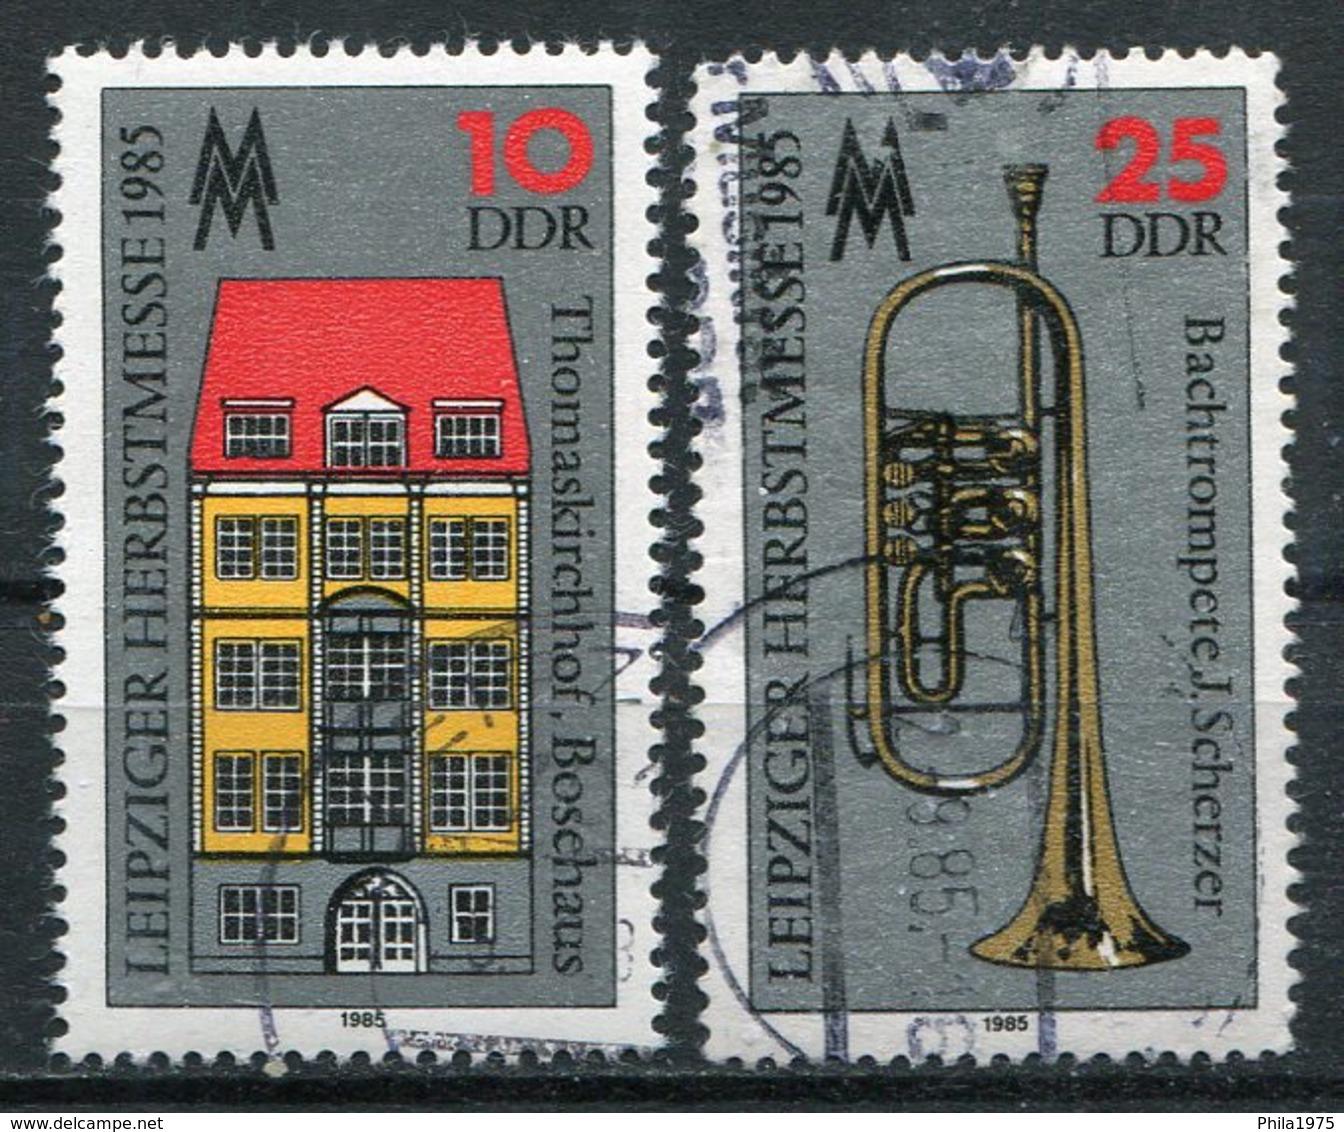 DDR Michel-Nr. 2963-2964 Gestempelt - DDR